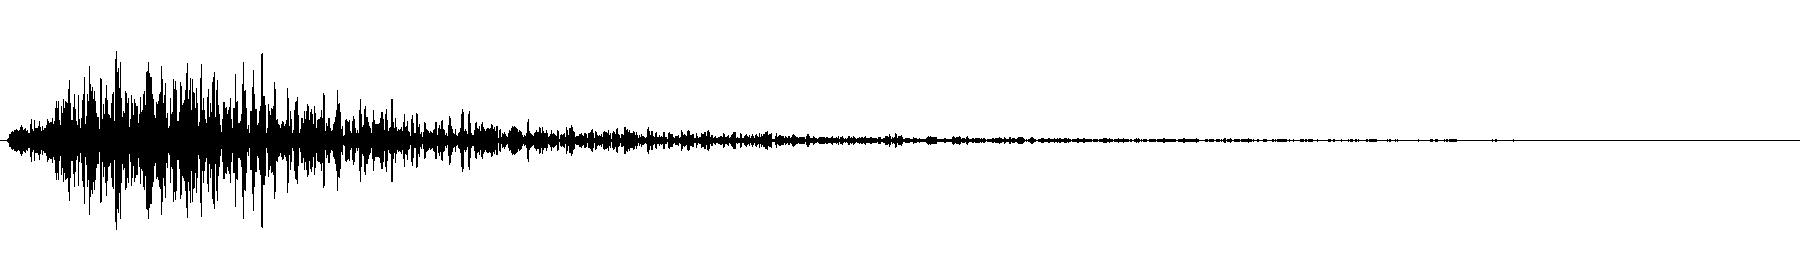 verb clang02